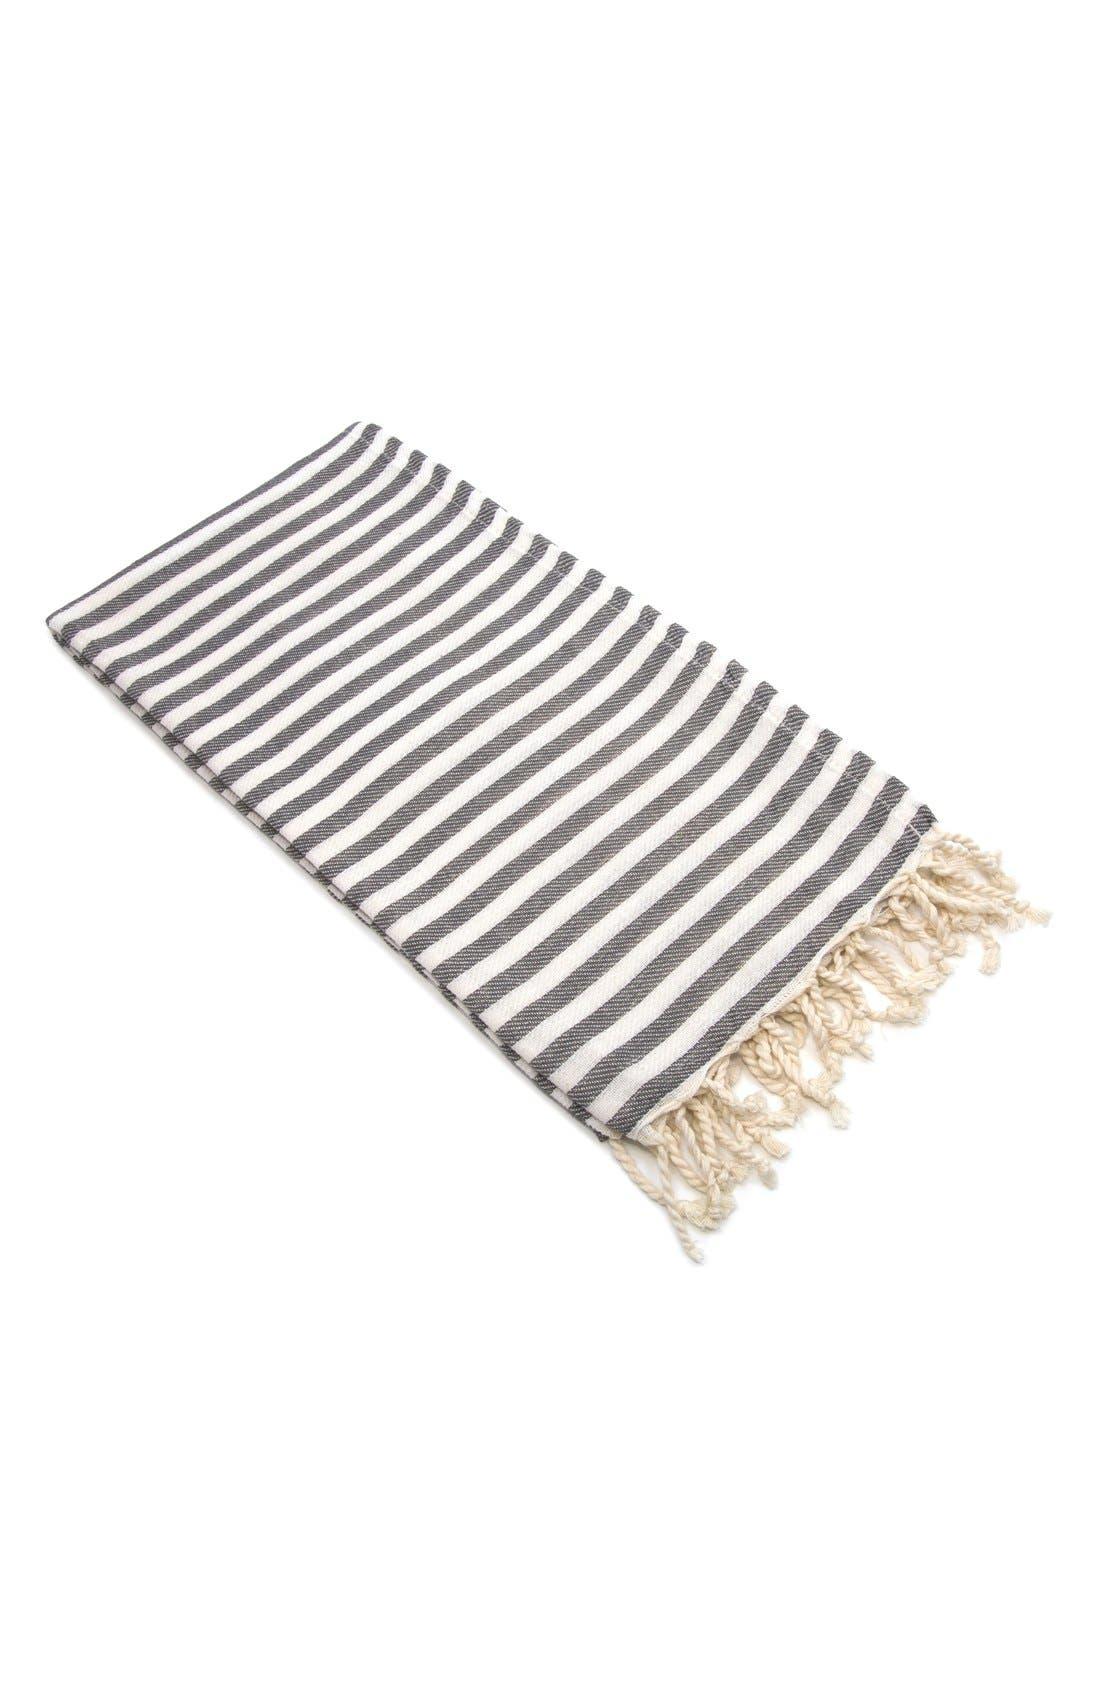 Linum Home Textiles 'Fun in the Sun' Turkish Pestemal Towel